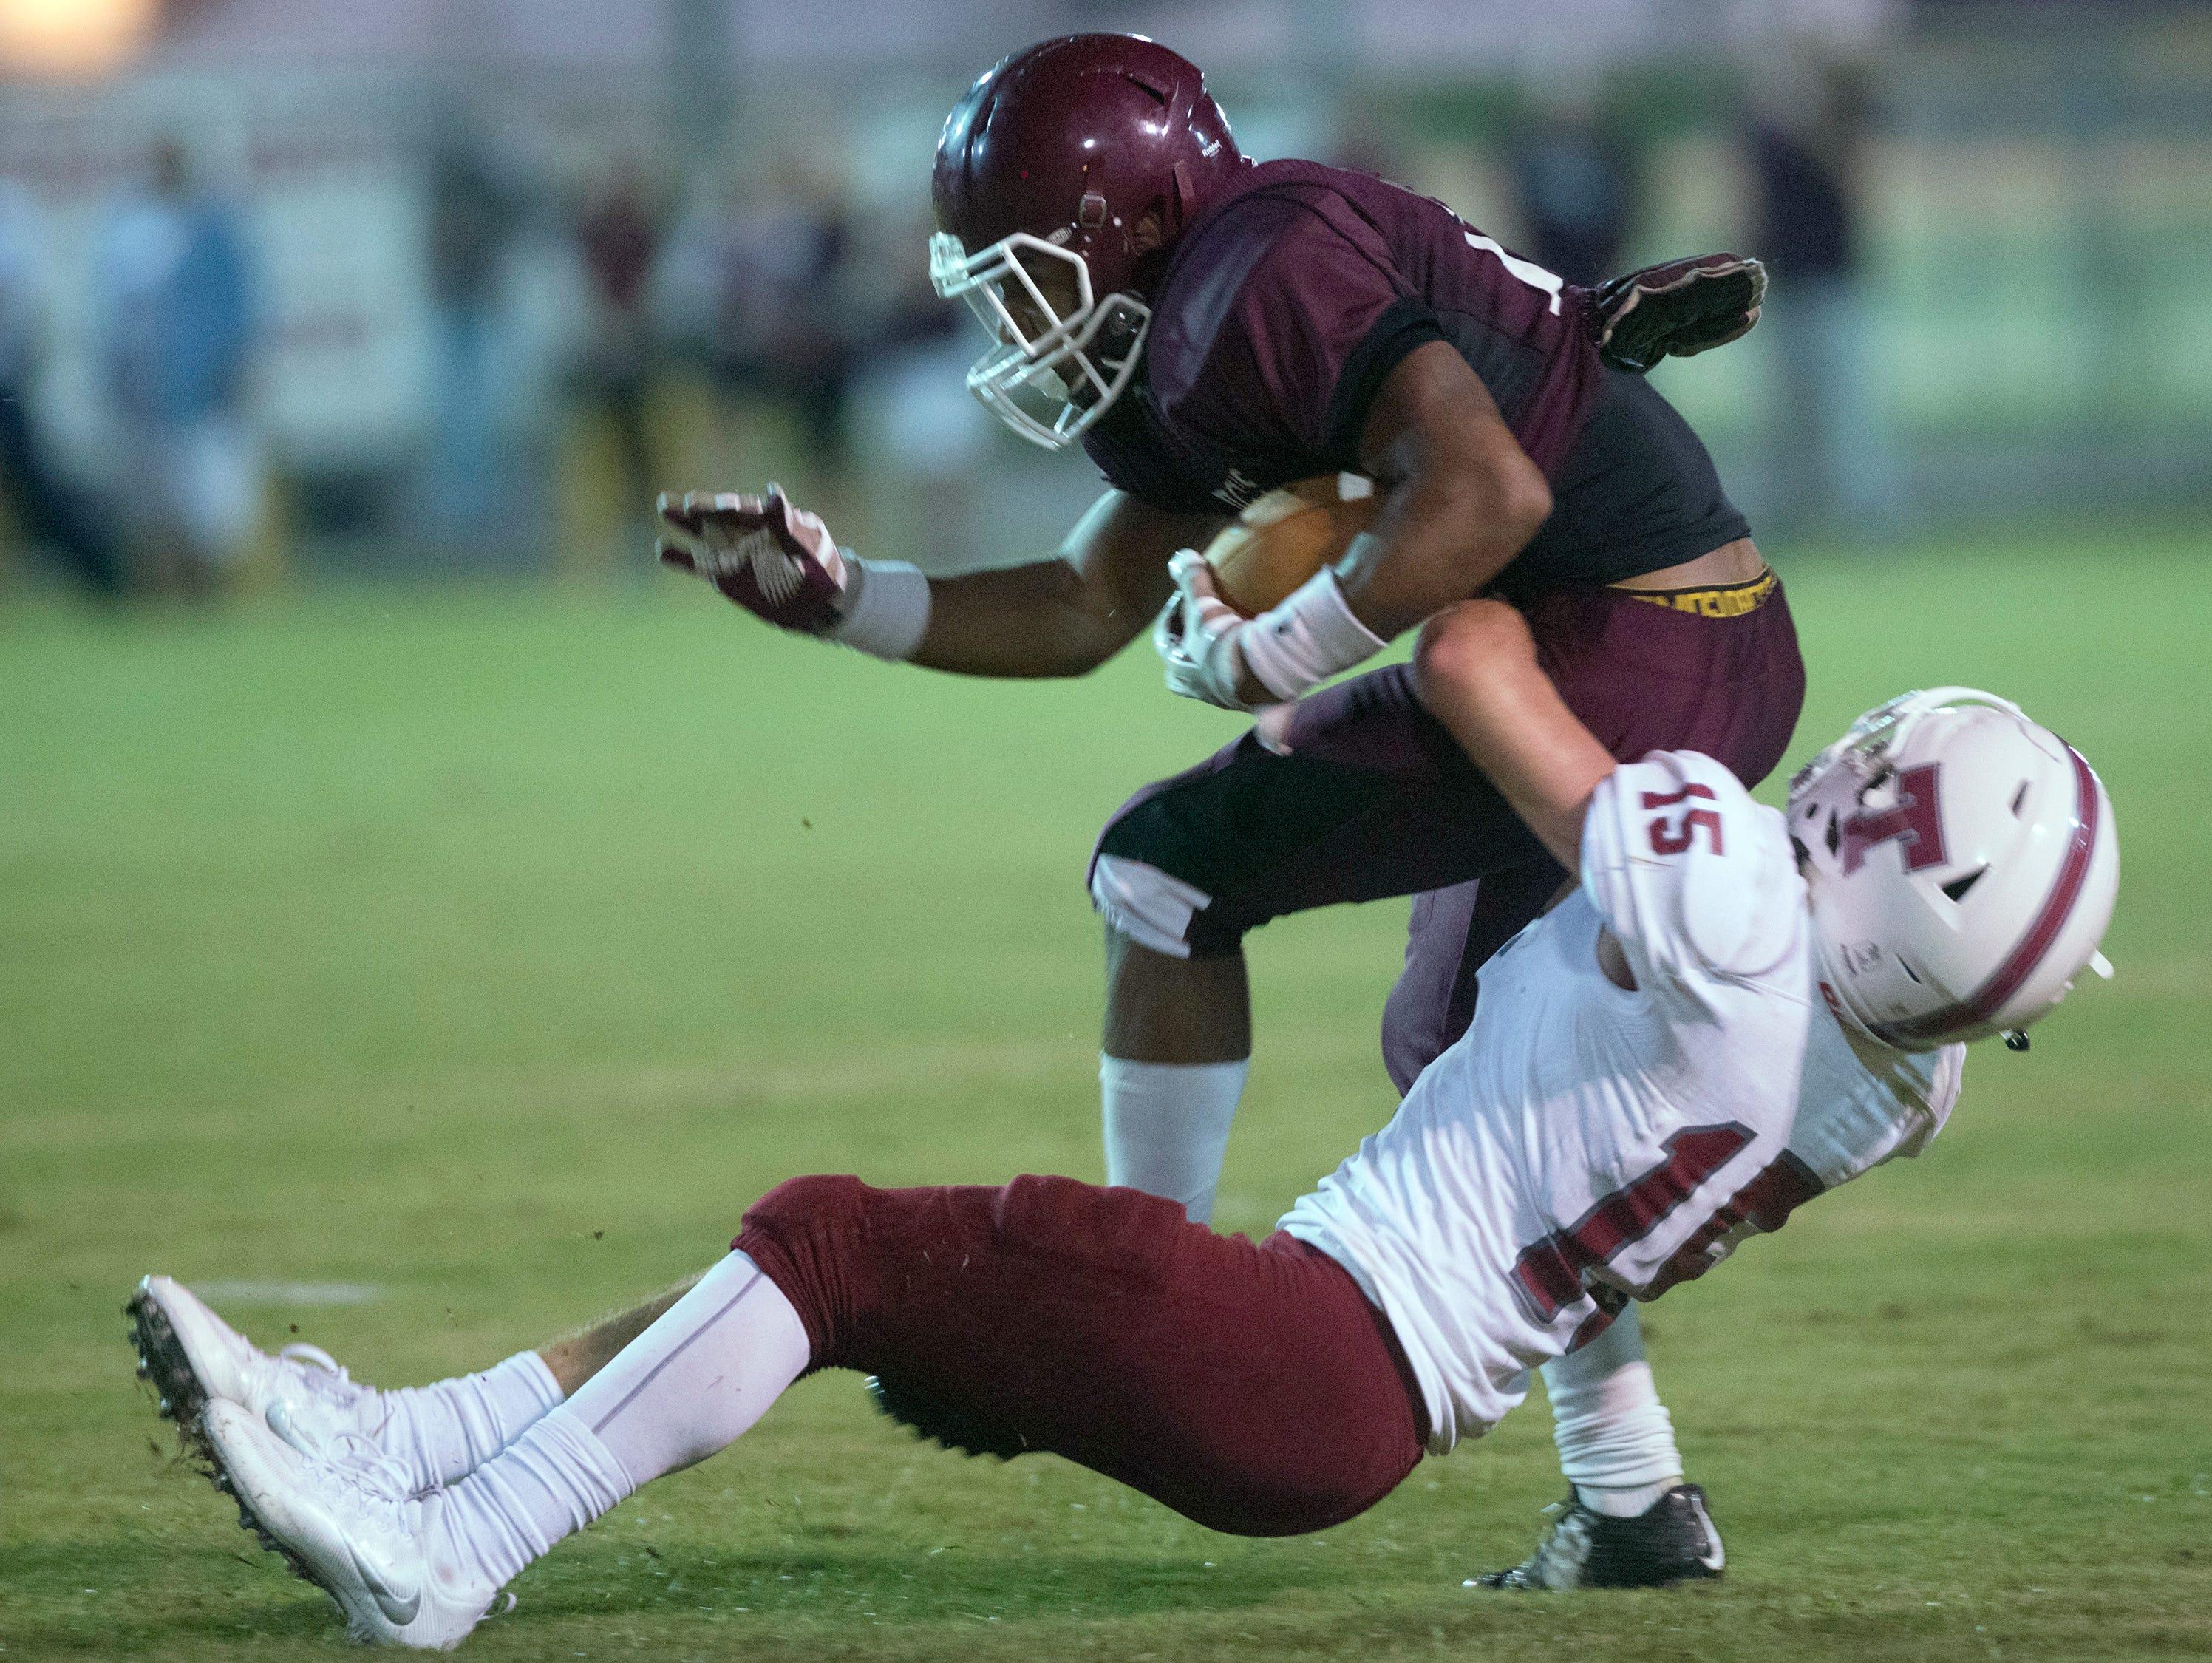 Tate High School safety, Reid Halfacre, (No. 15) wraps up Pensacola High School wide receiver, Freddie Hughley, (No. 13) during Friday night's preseason opener.